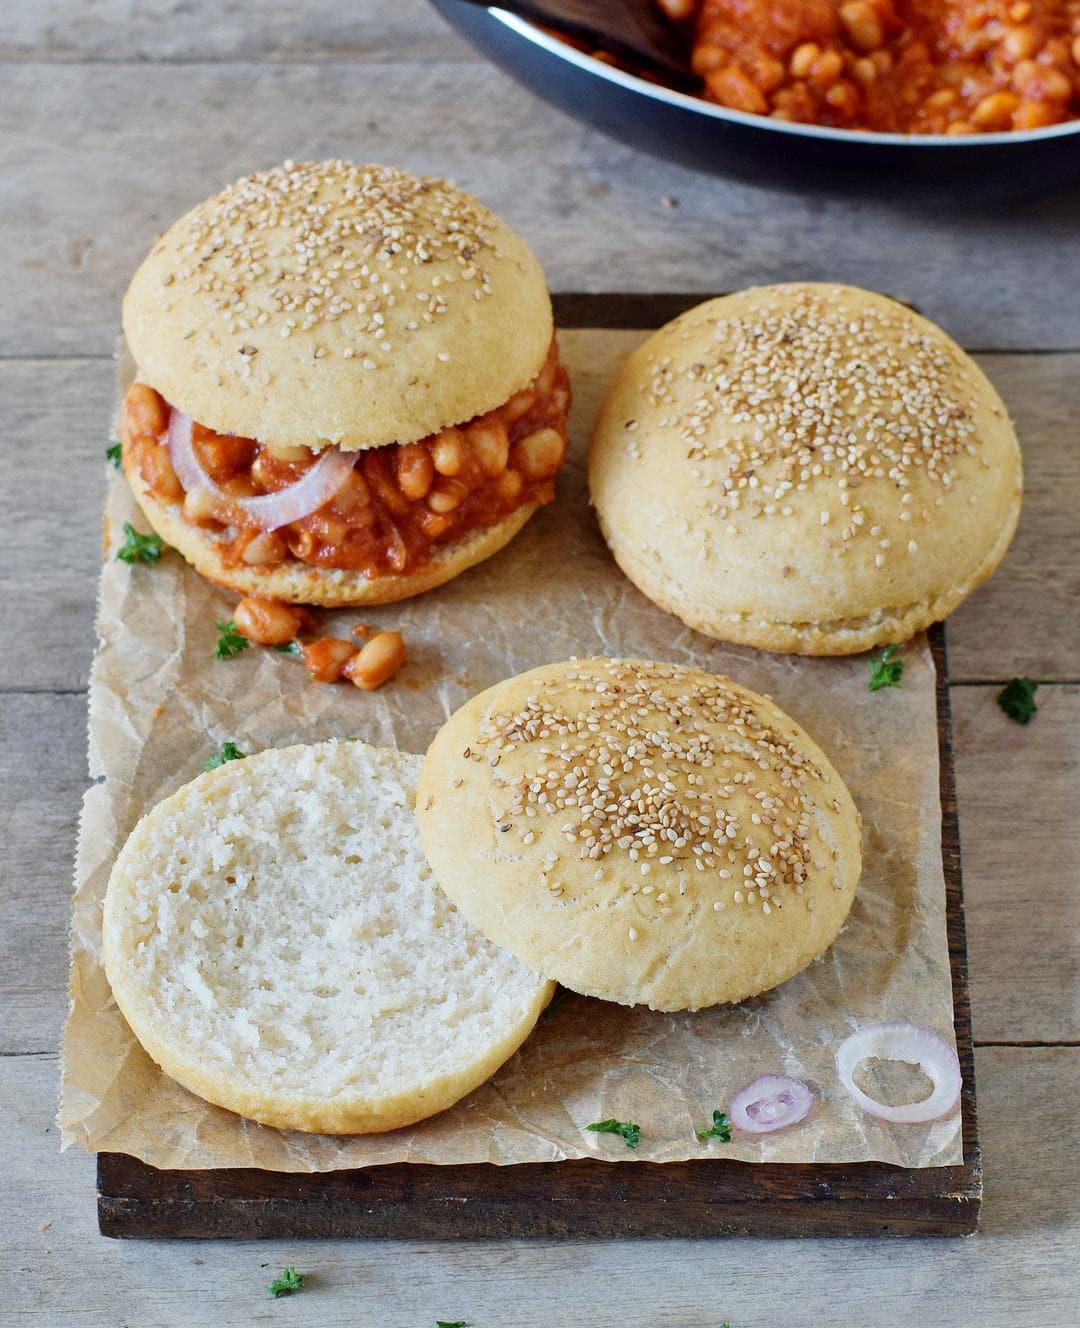 soft gluten-free healthy burger buns to make vegan sloppy joes